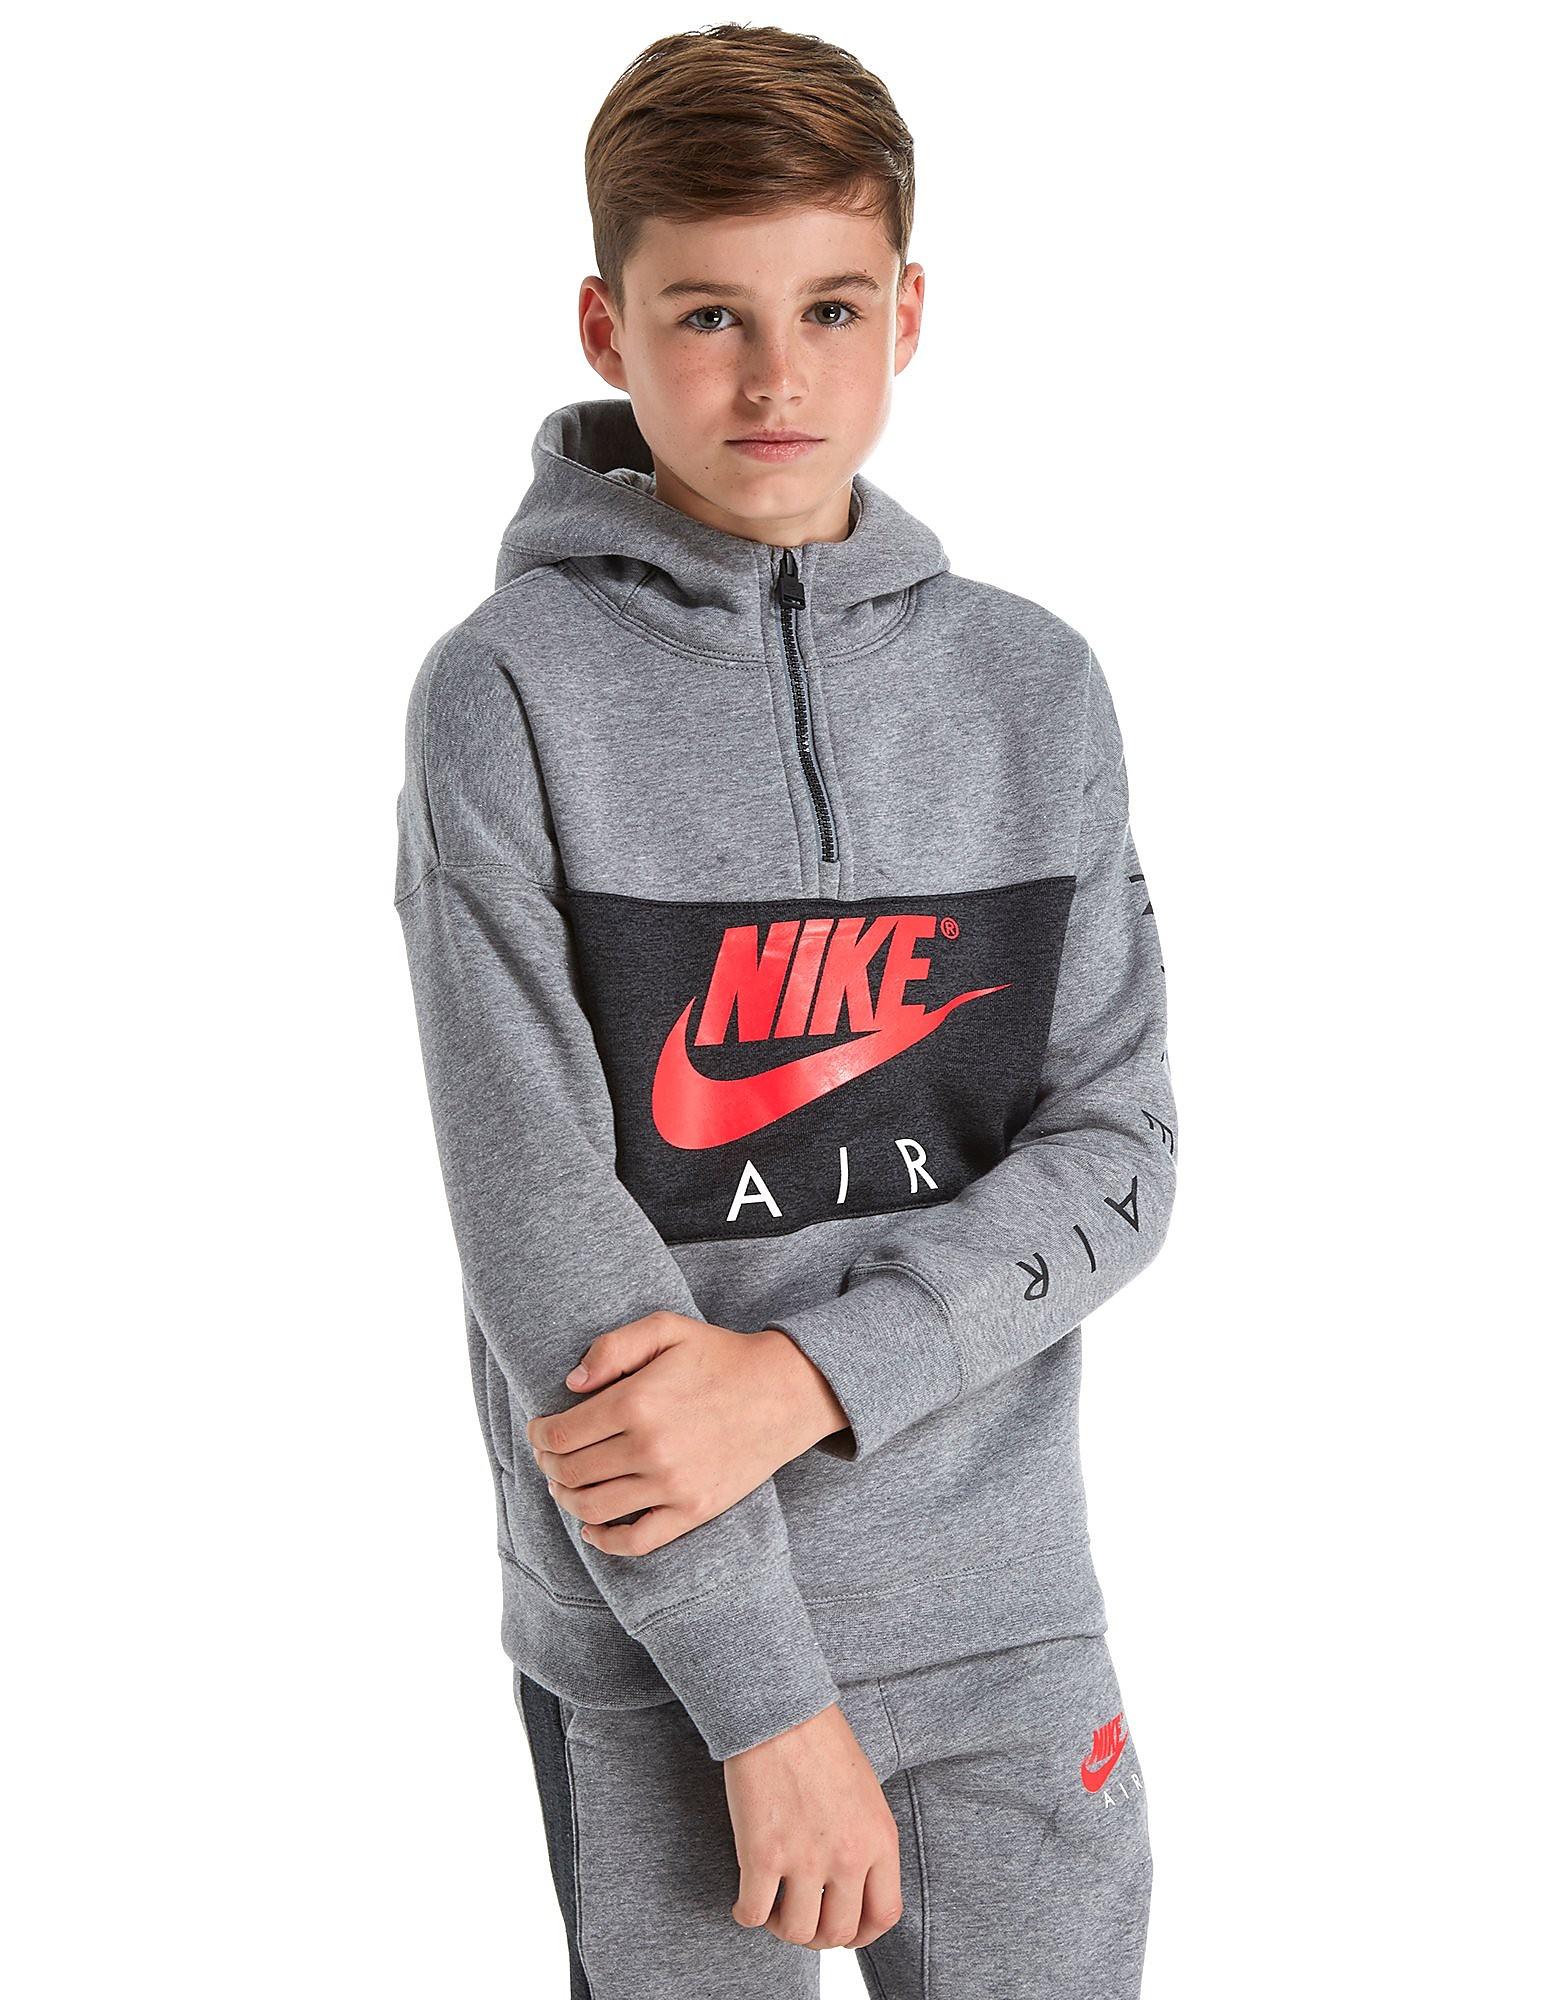 Nike Air 1/4 Zip Hoody Junior